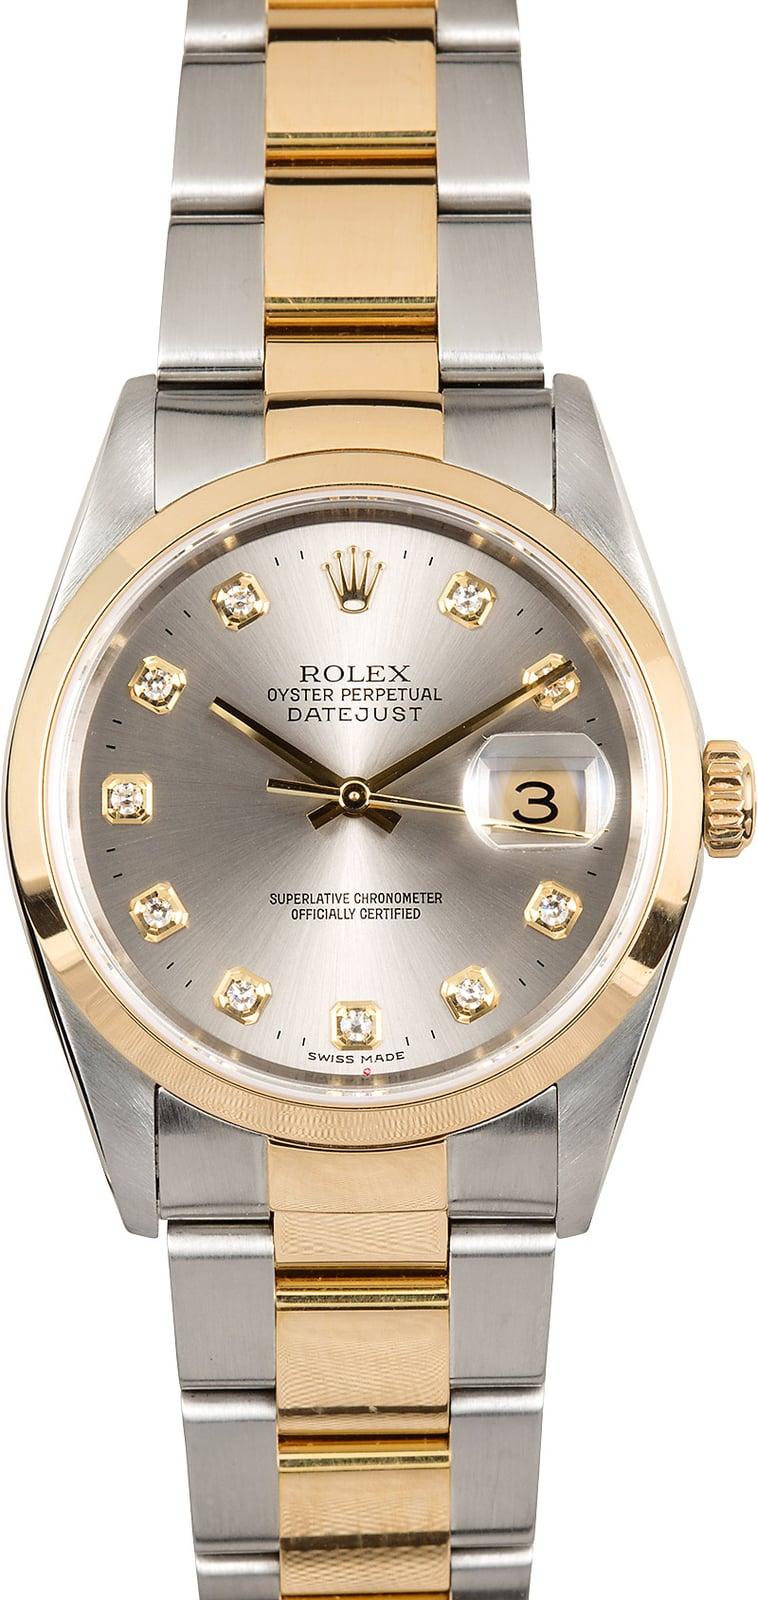 Rolex Datejust 16203 Diamond Dial